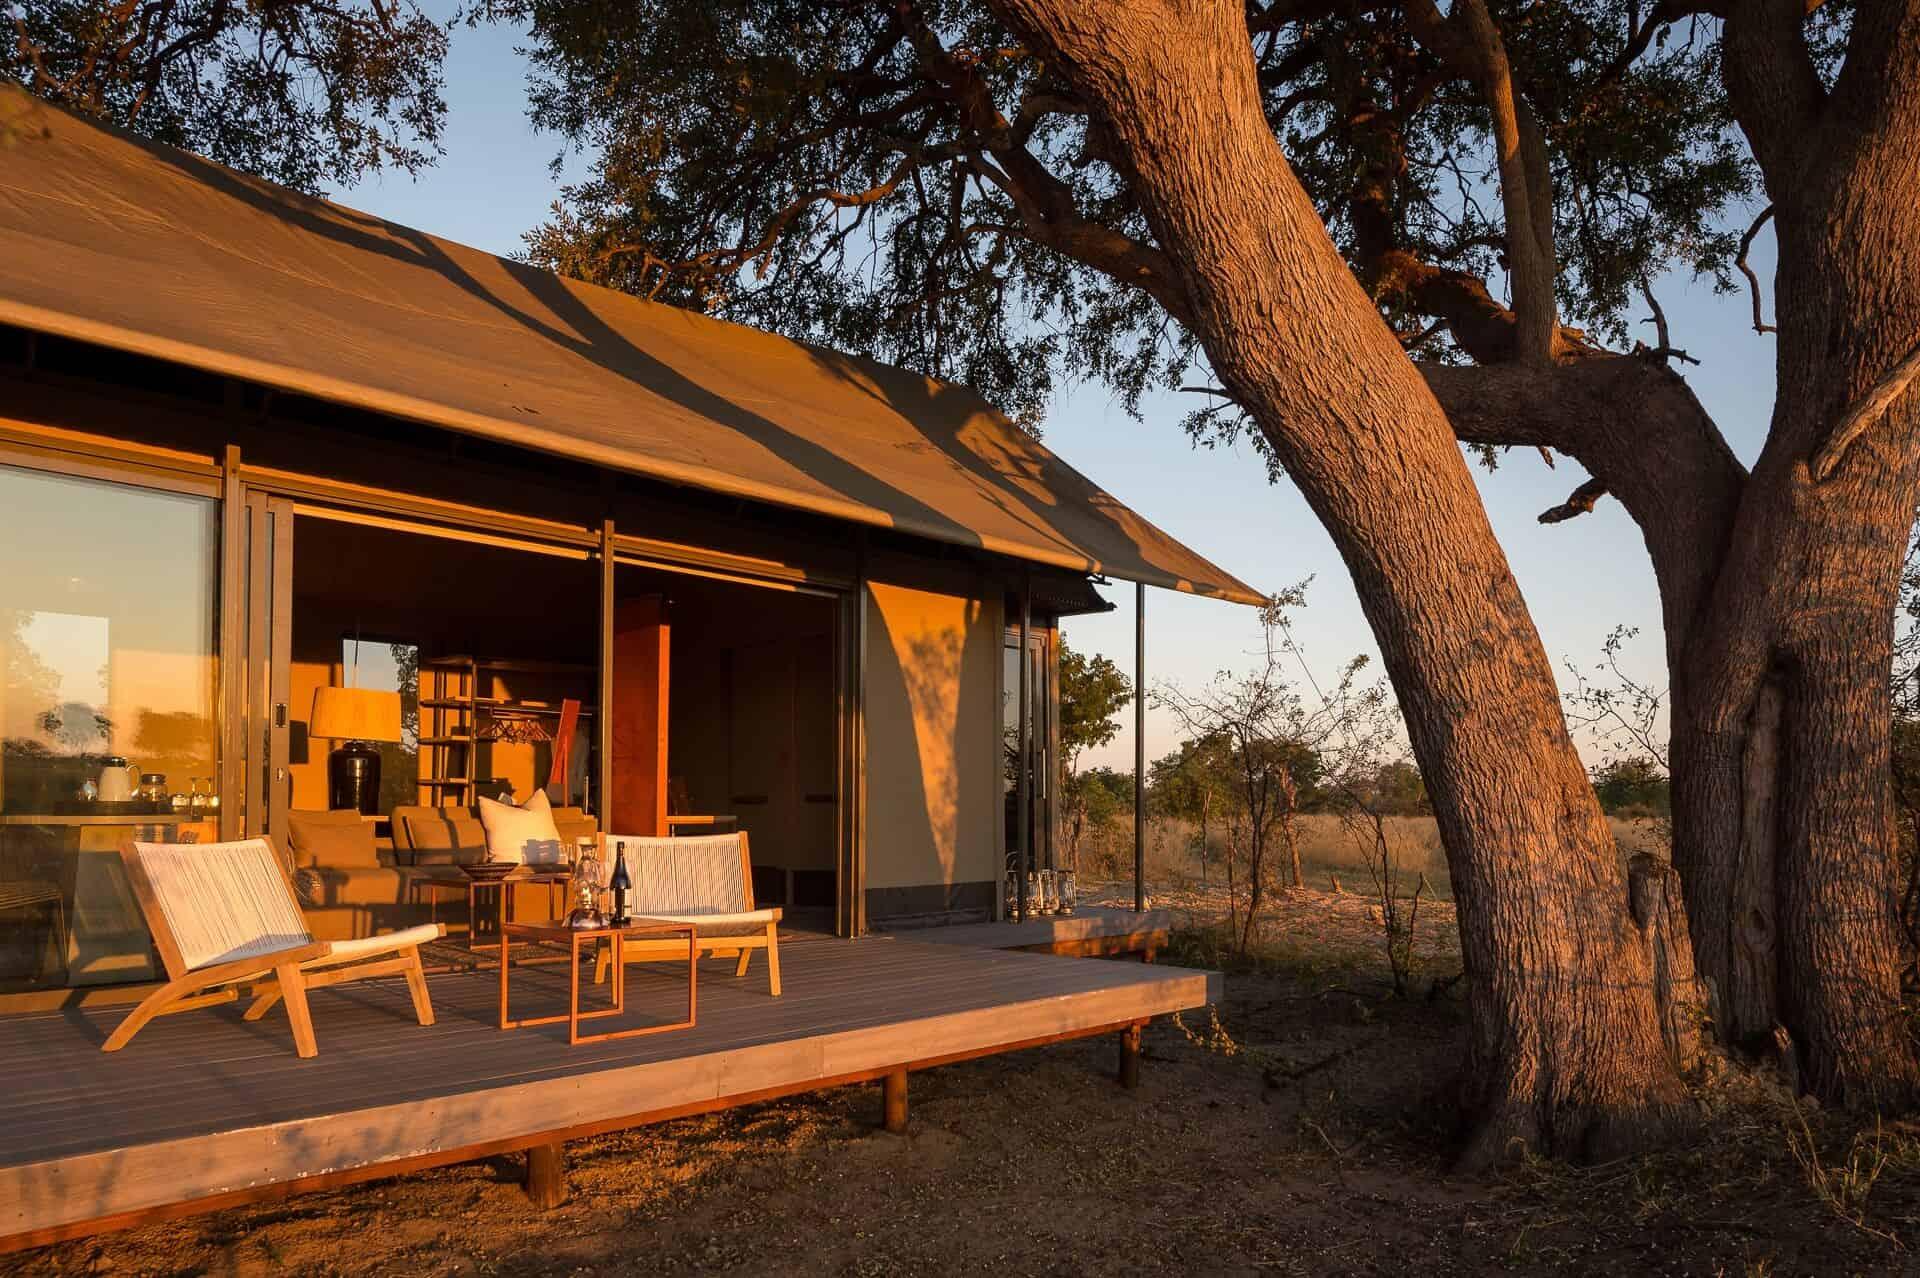 Tailormade-safaris-linkwasha-camp-exteriorfront-hwange-zimbabwe